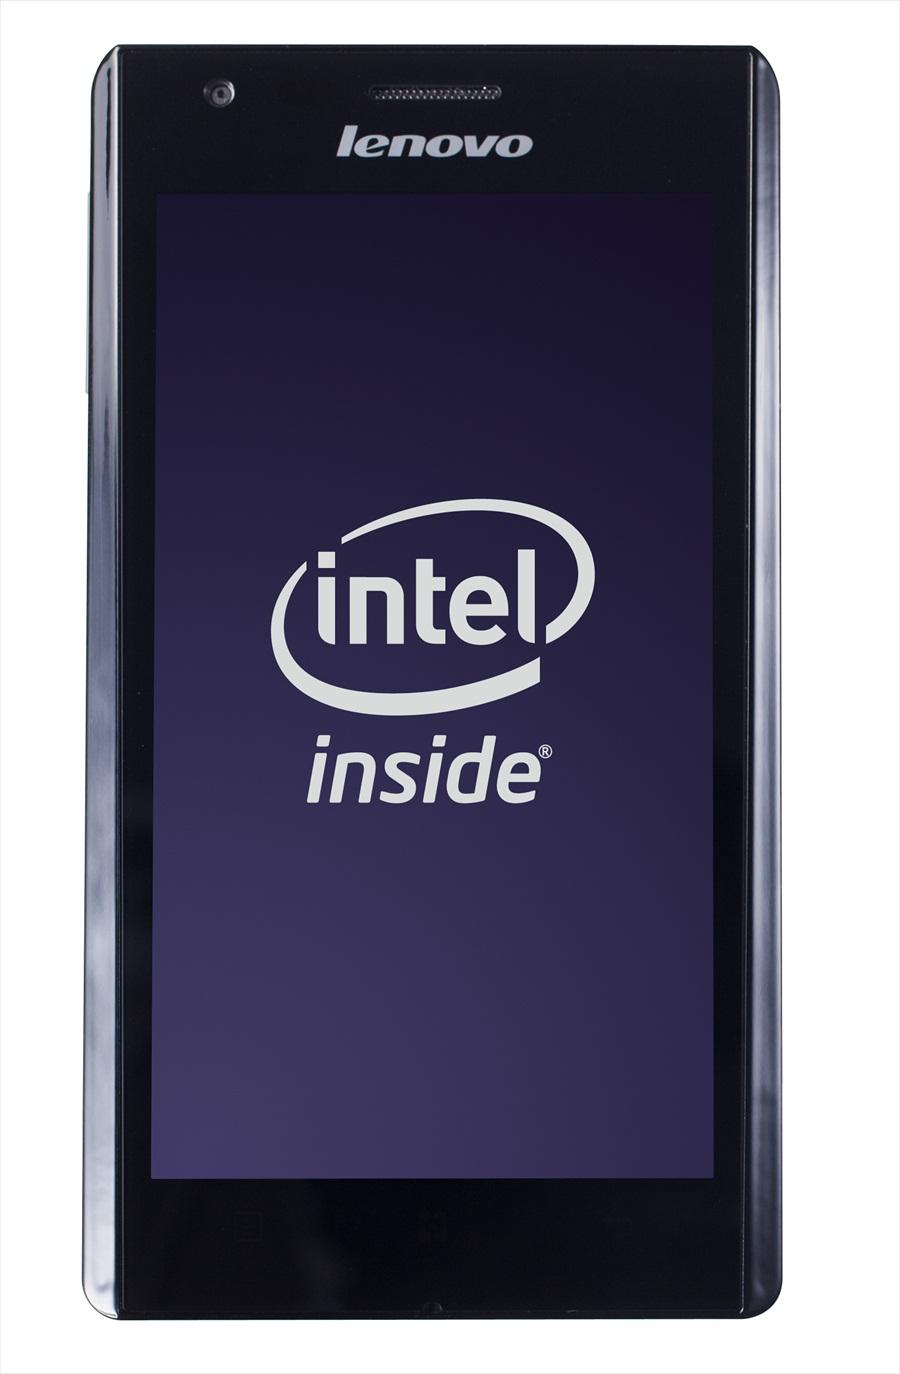 Kinezi već mogu kupiti Intel Inside telefon